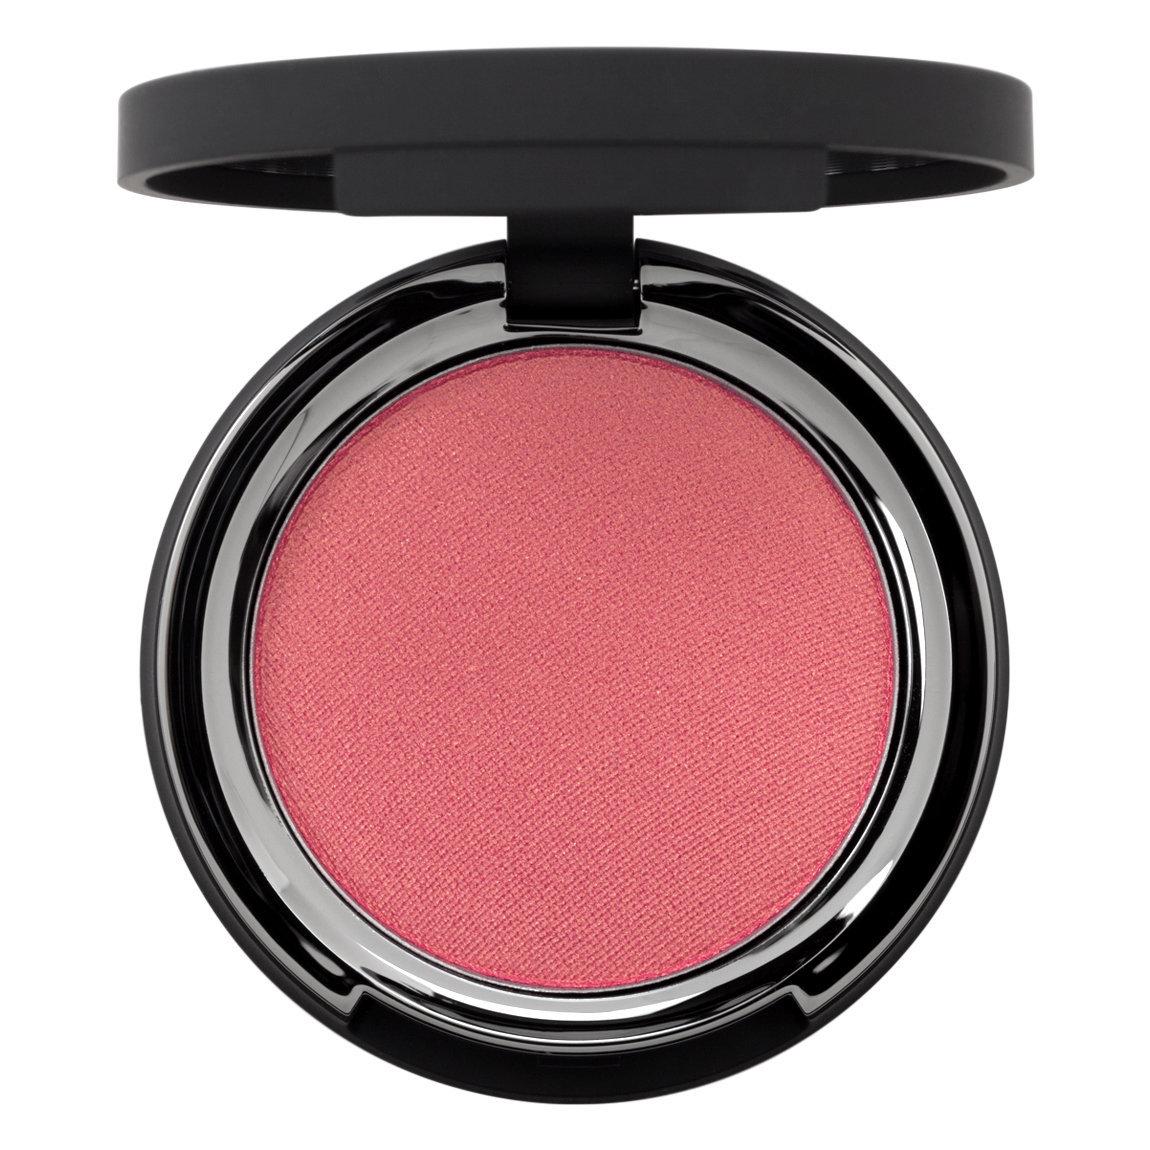 IT Cosmetics  Vitality Cheek Flush Powder Blush Stain Pretty In Peony alternative view 1 - product swatch.